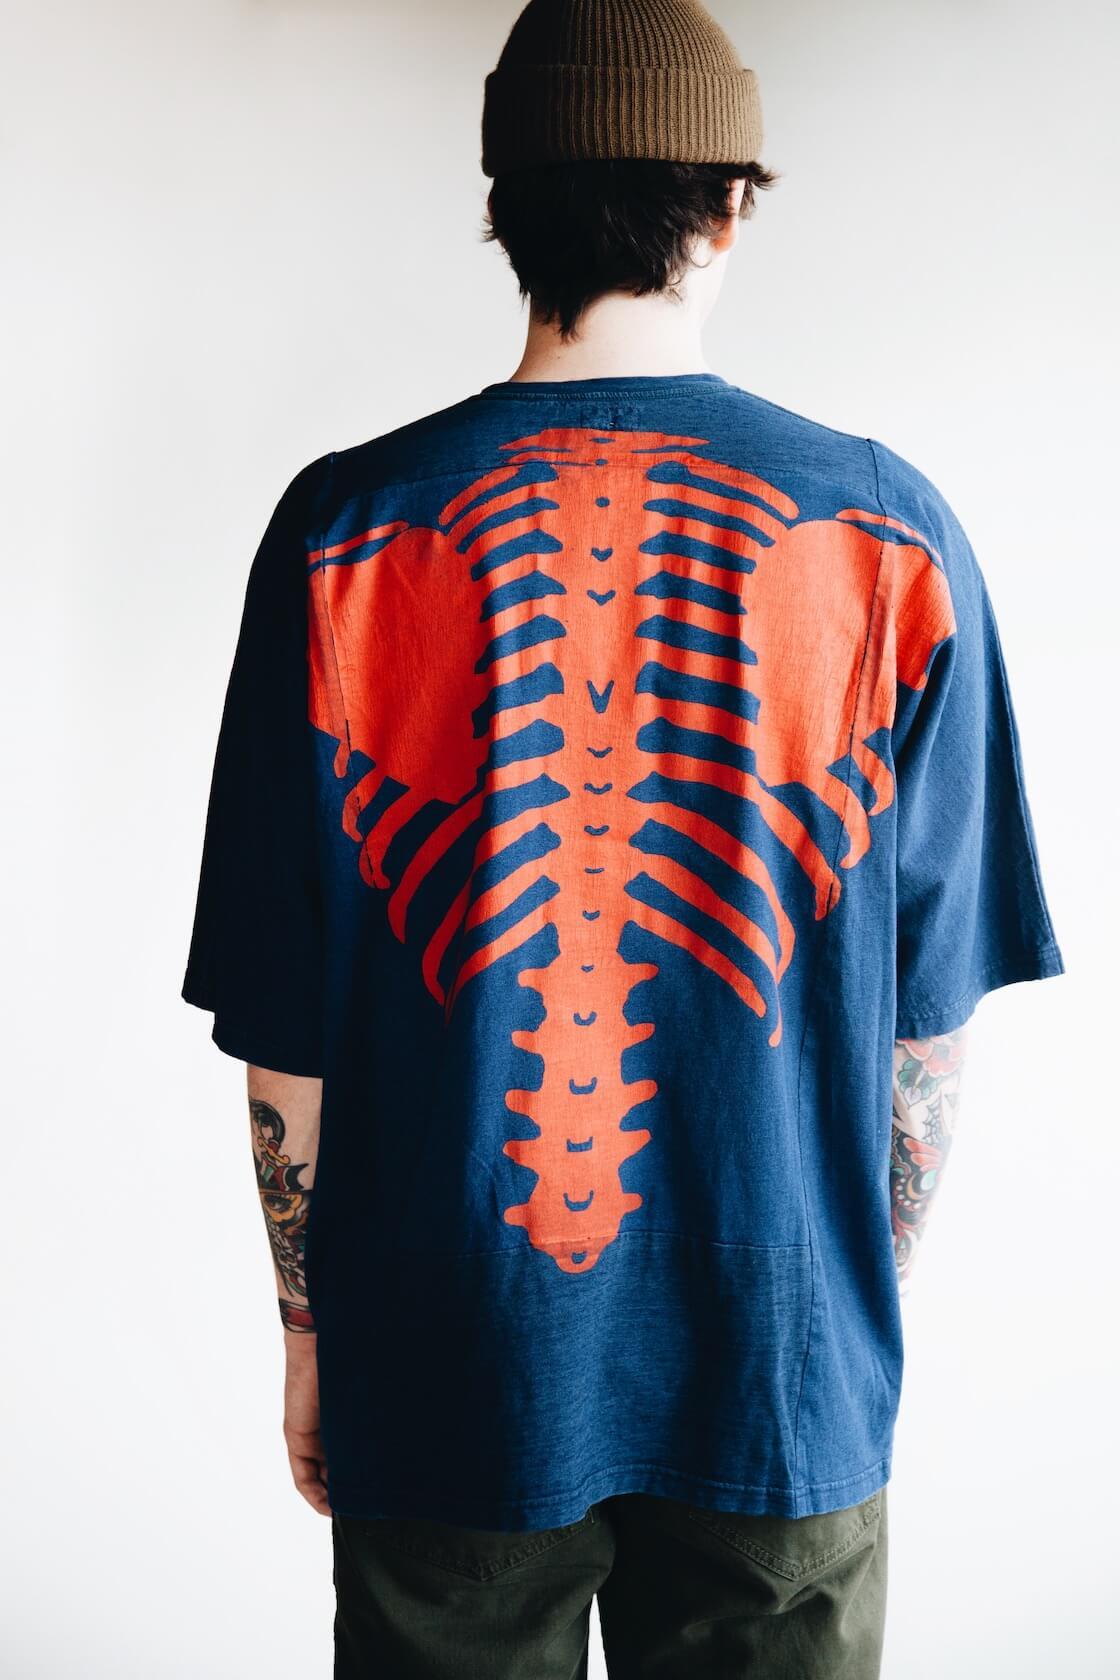 kapital kountry bones tee in navy and orange on body